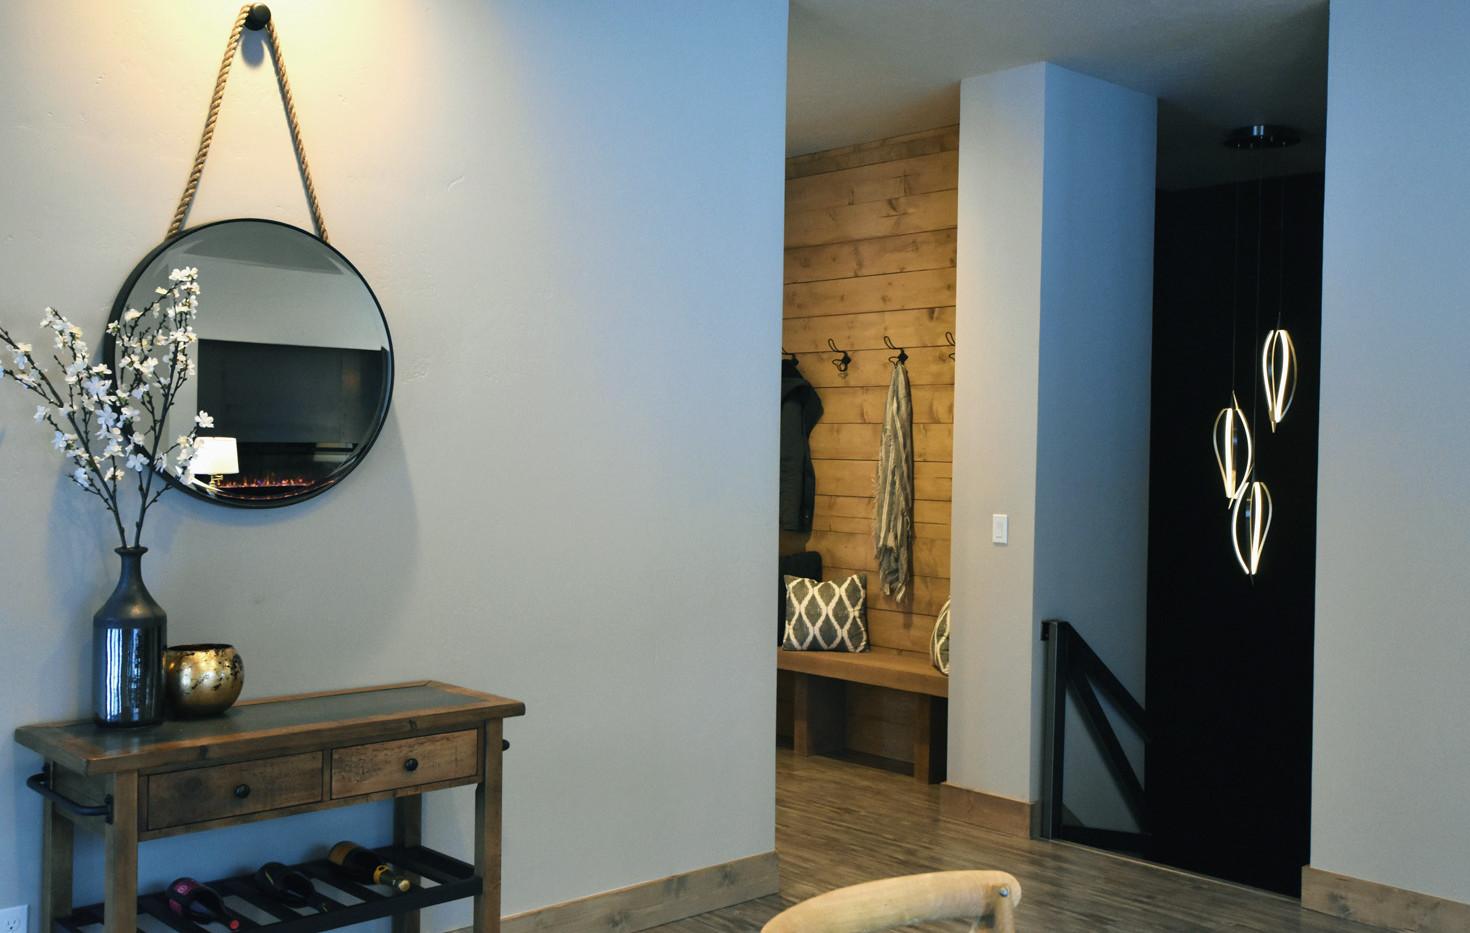 The Driftside Retreat @whiteravenvenue - Foyer & Stair